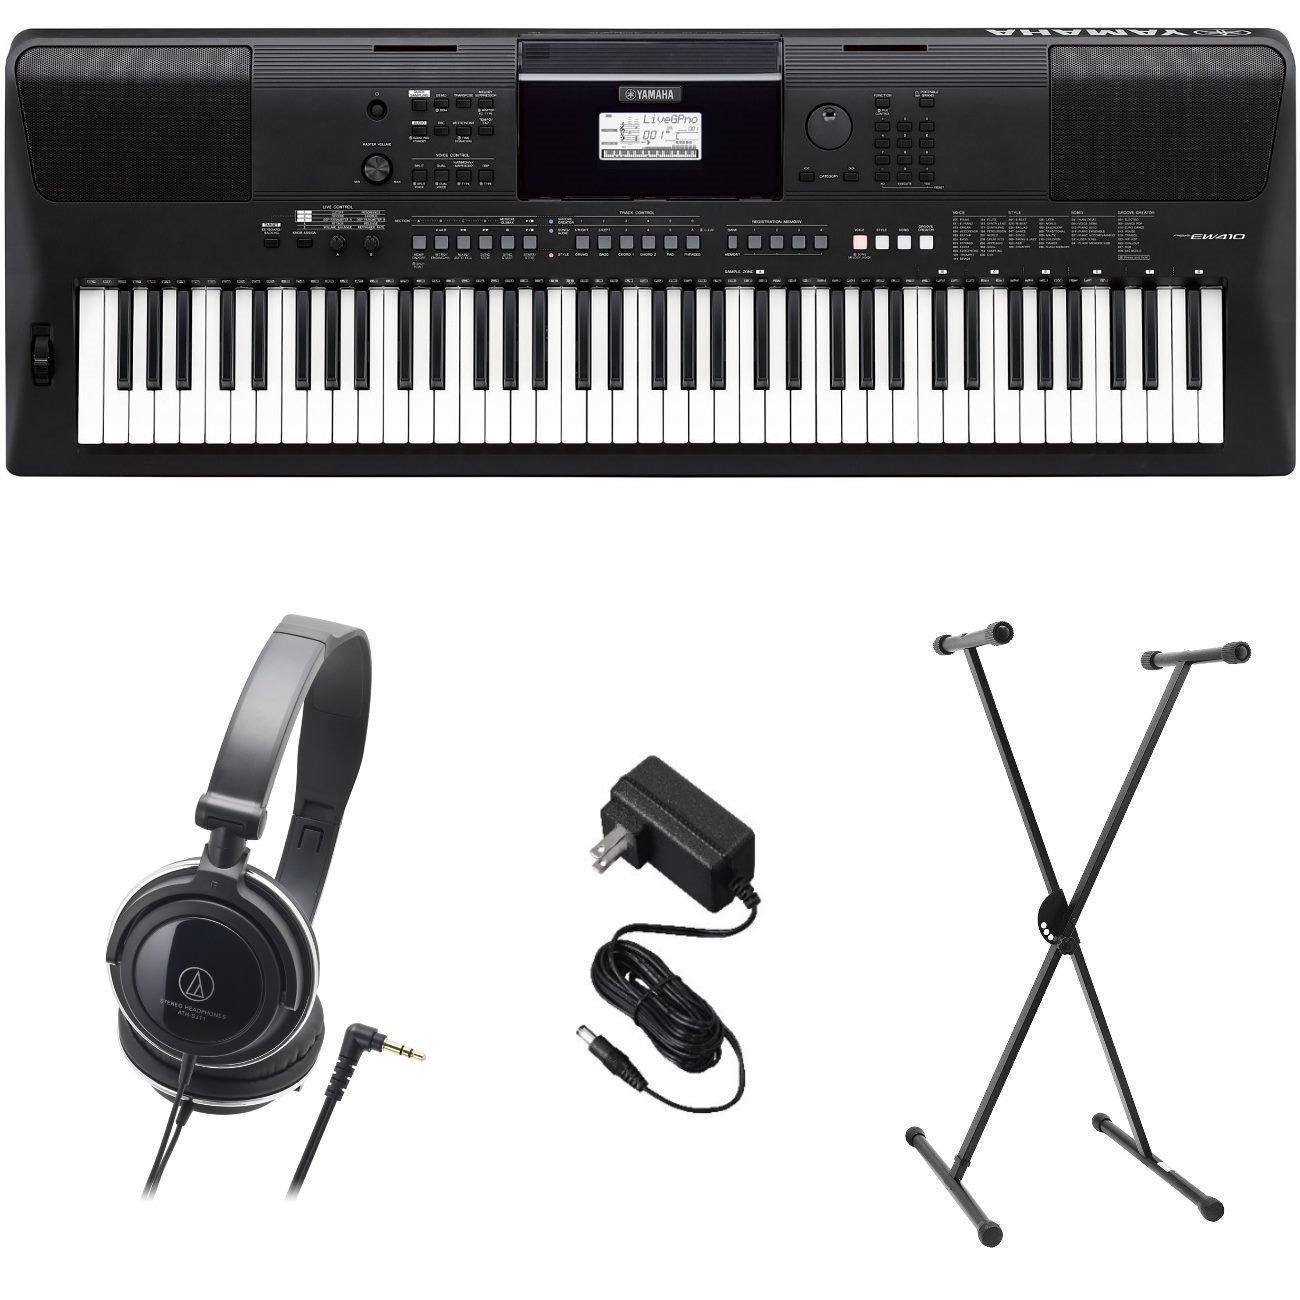 Yamaha PSR-EW410 PKS Premium Keyboard Pack with Power Supply, Stand, and Headphones by YAMAHA